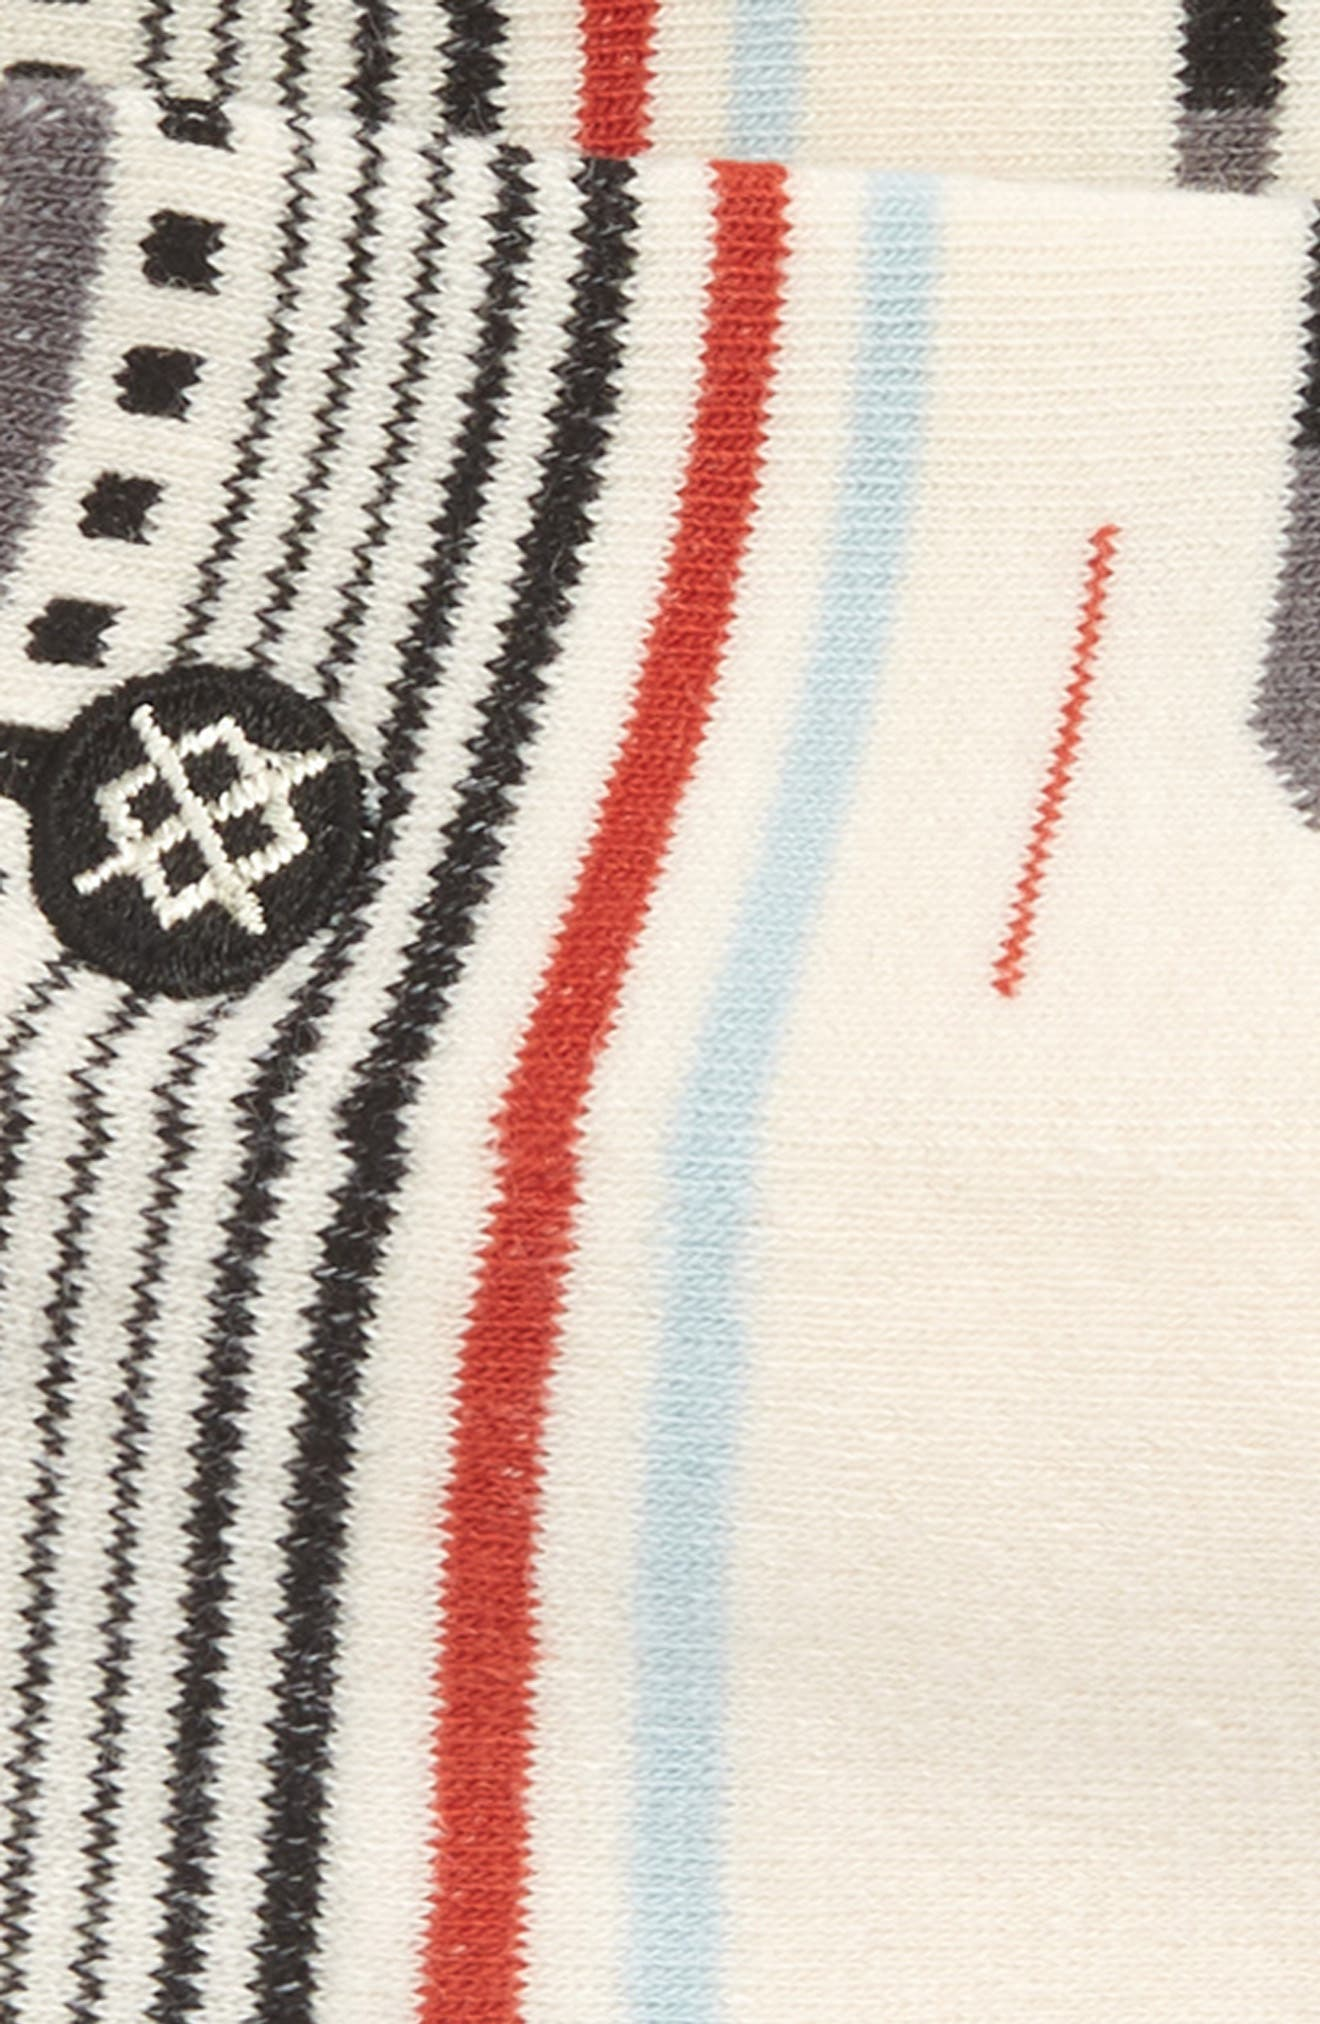 Cruz No-Show Socks,                             Alternate thumbnail 2, color,                             640